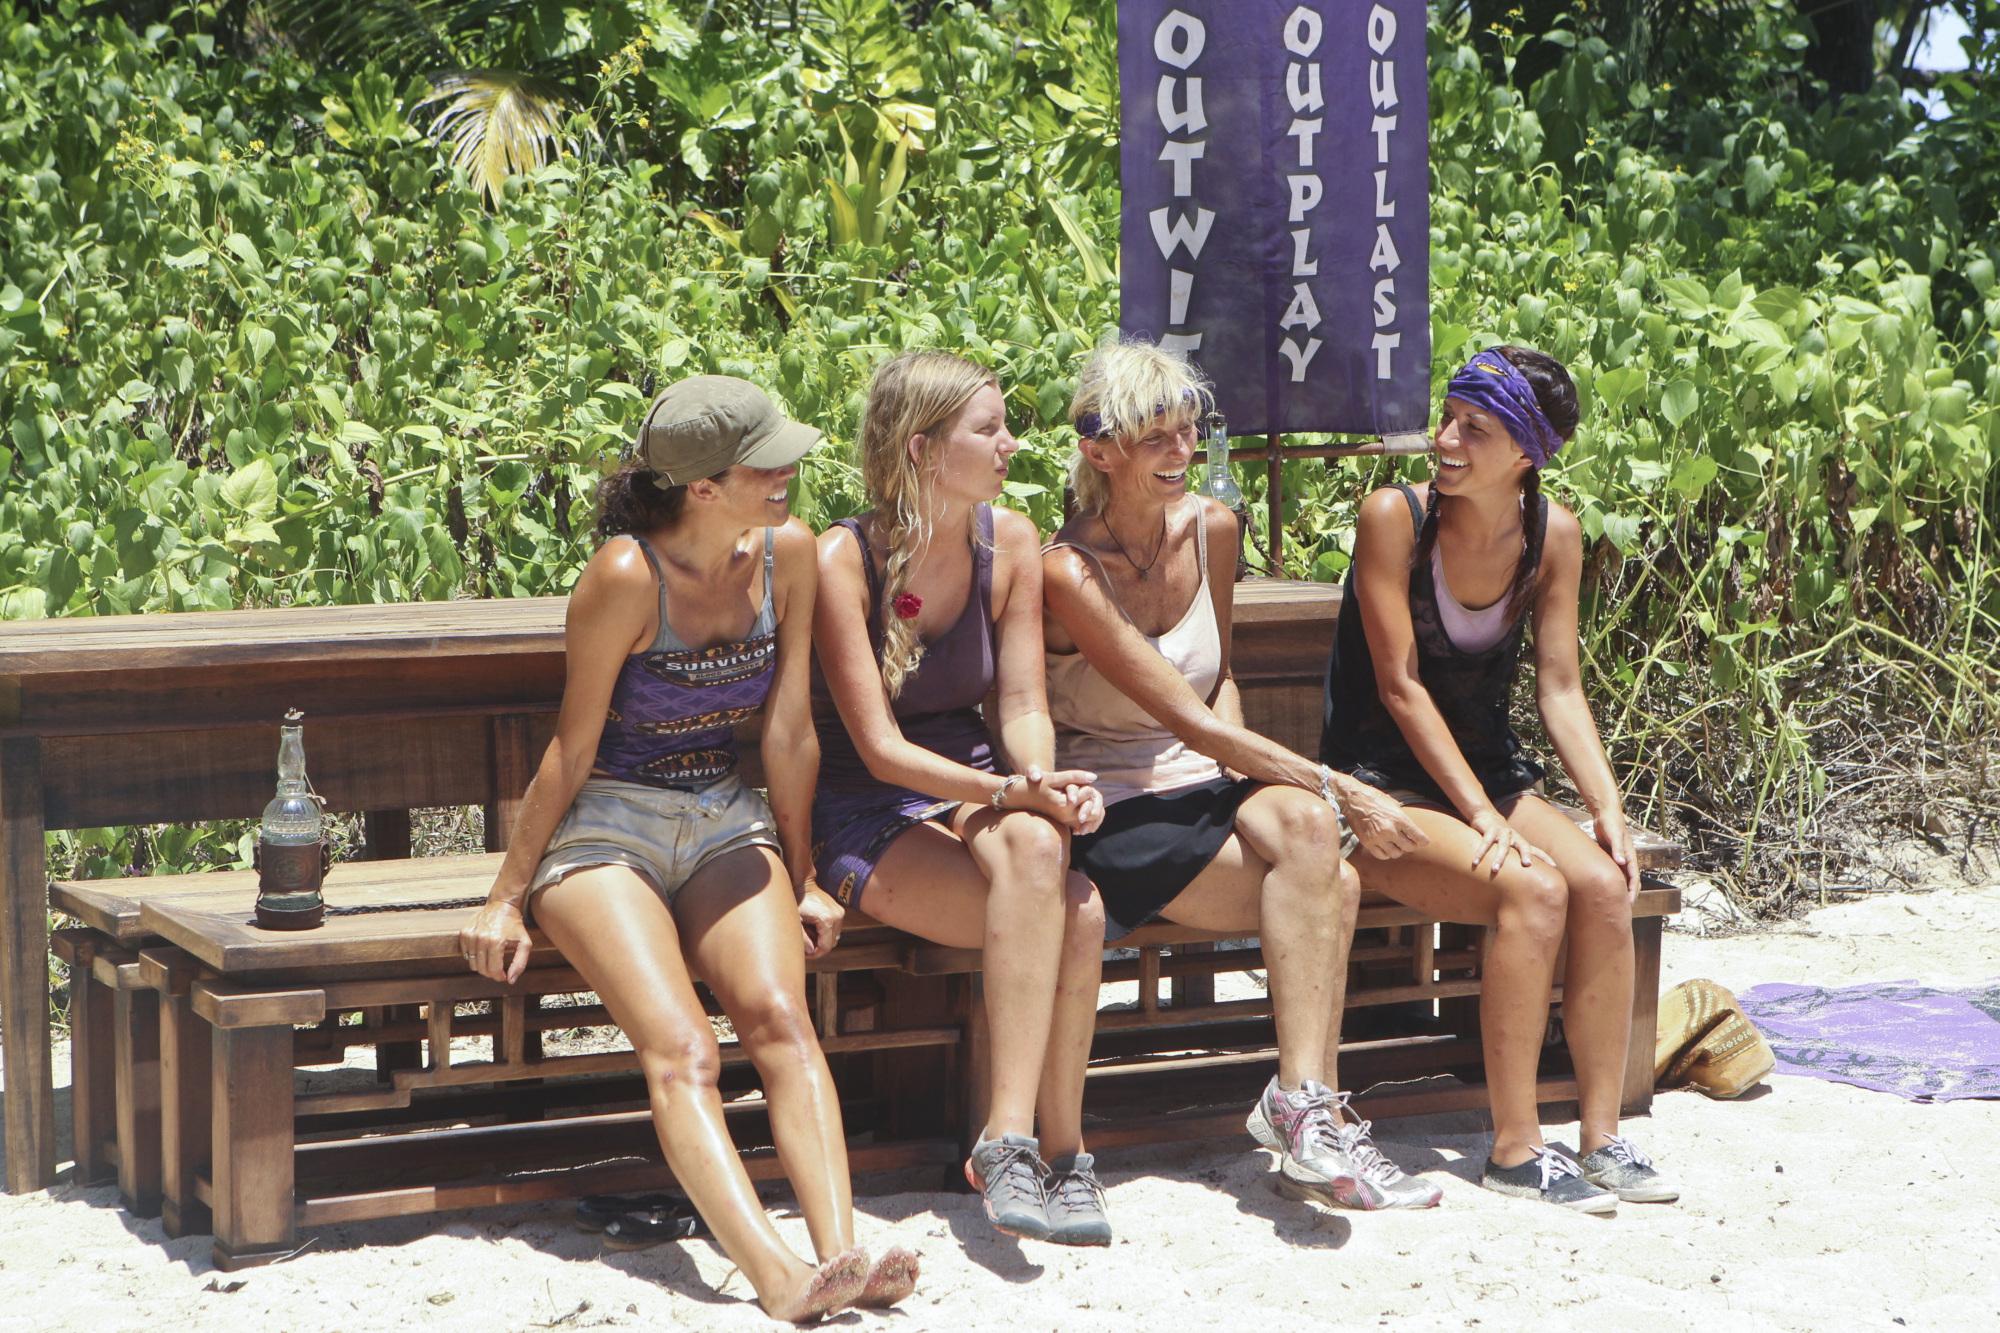 Laura, Katie, Tina and Ciera